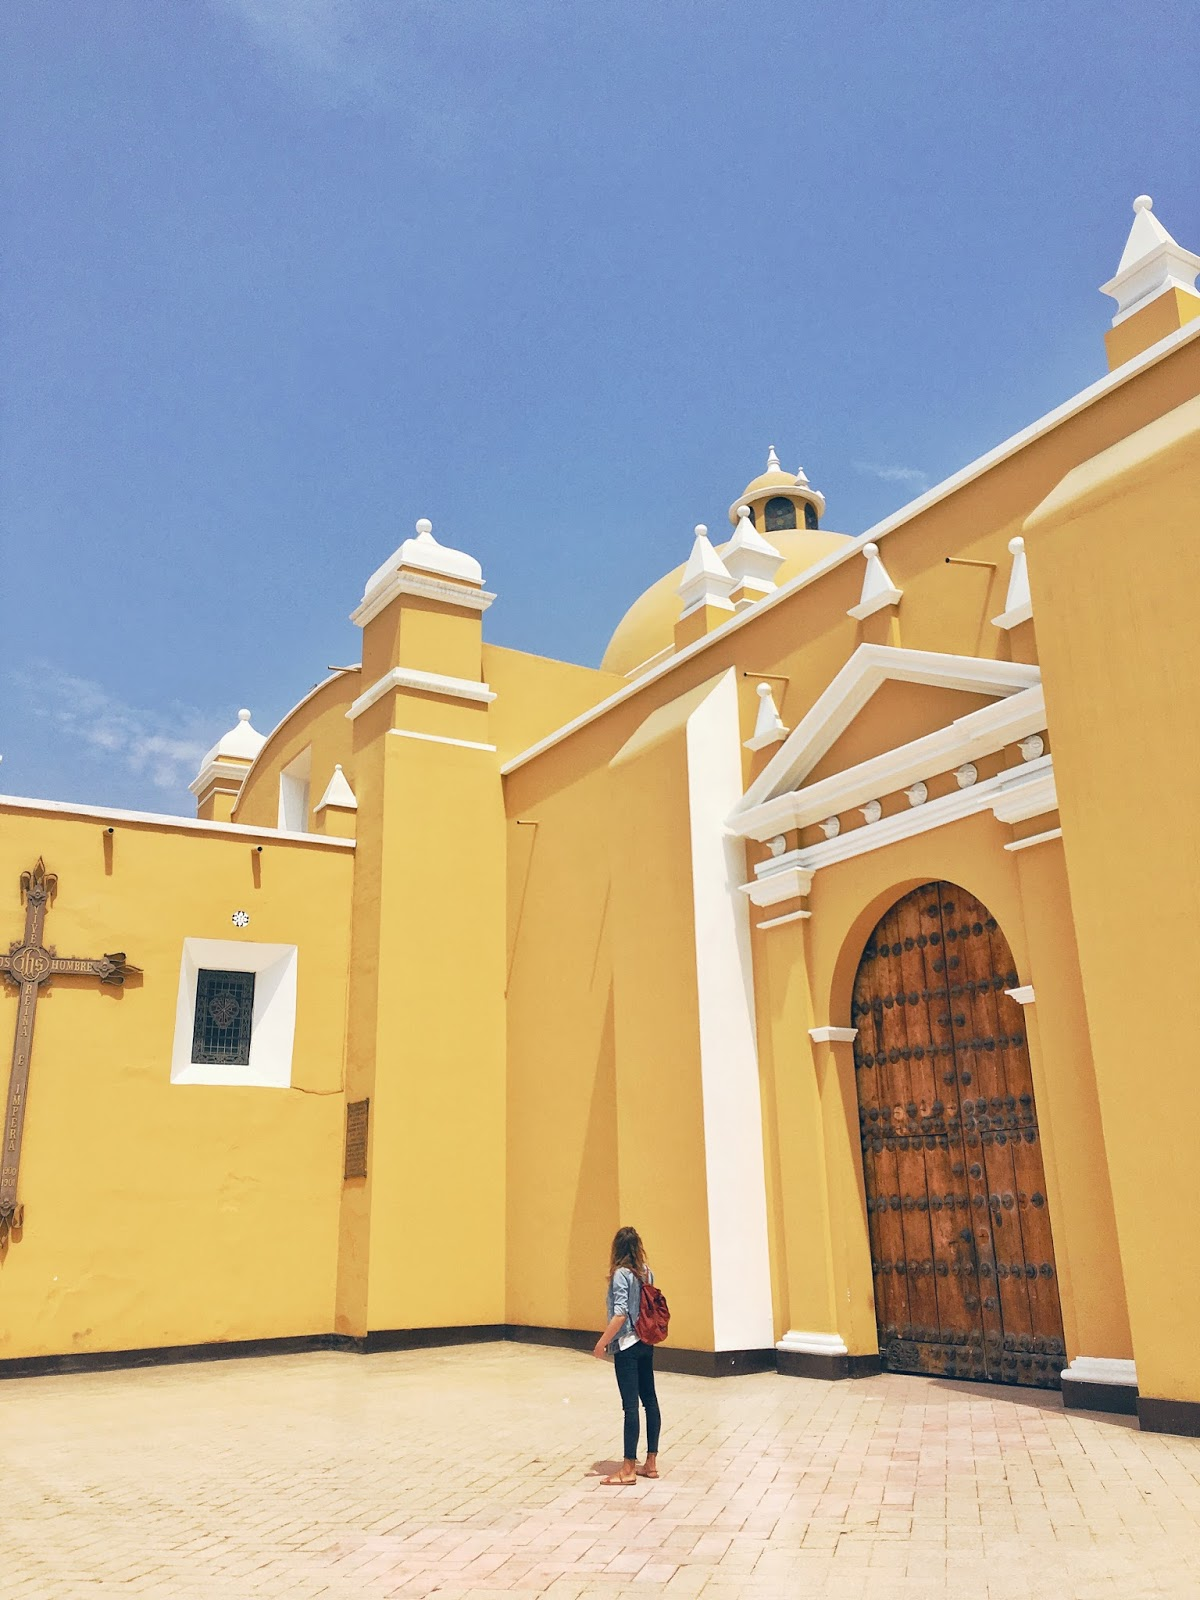 Peru, Trujillo, ejnets.com